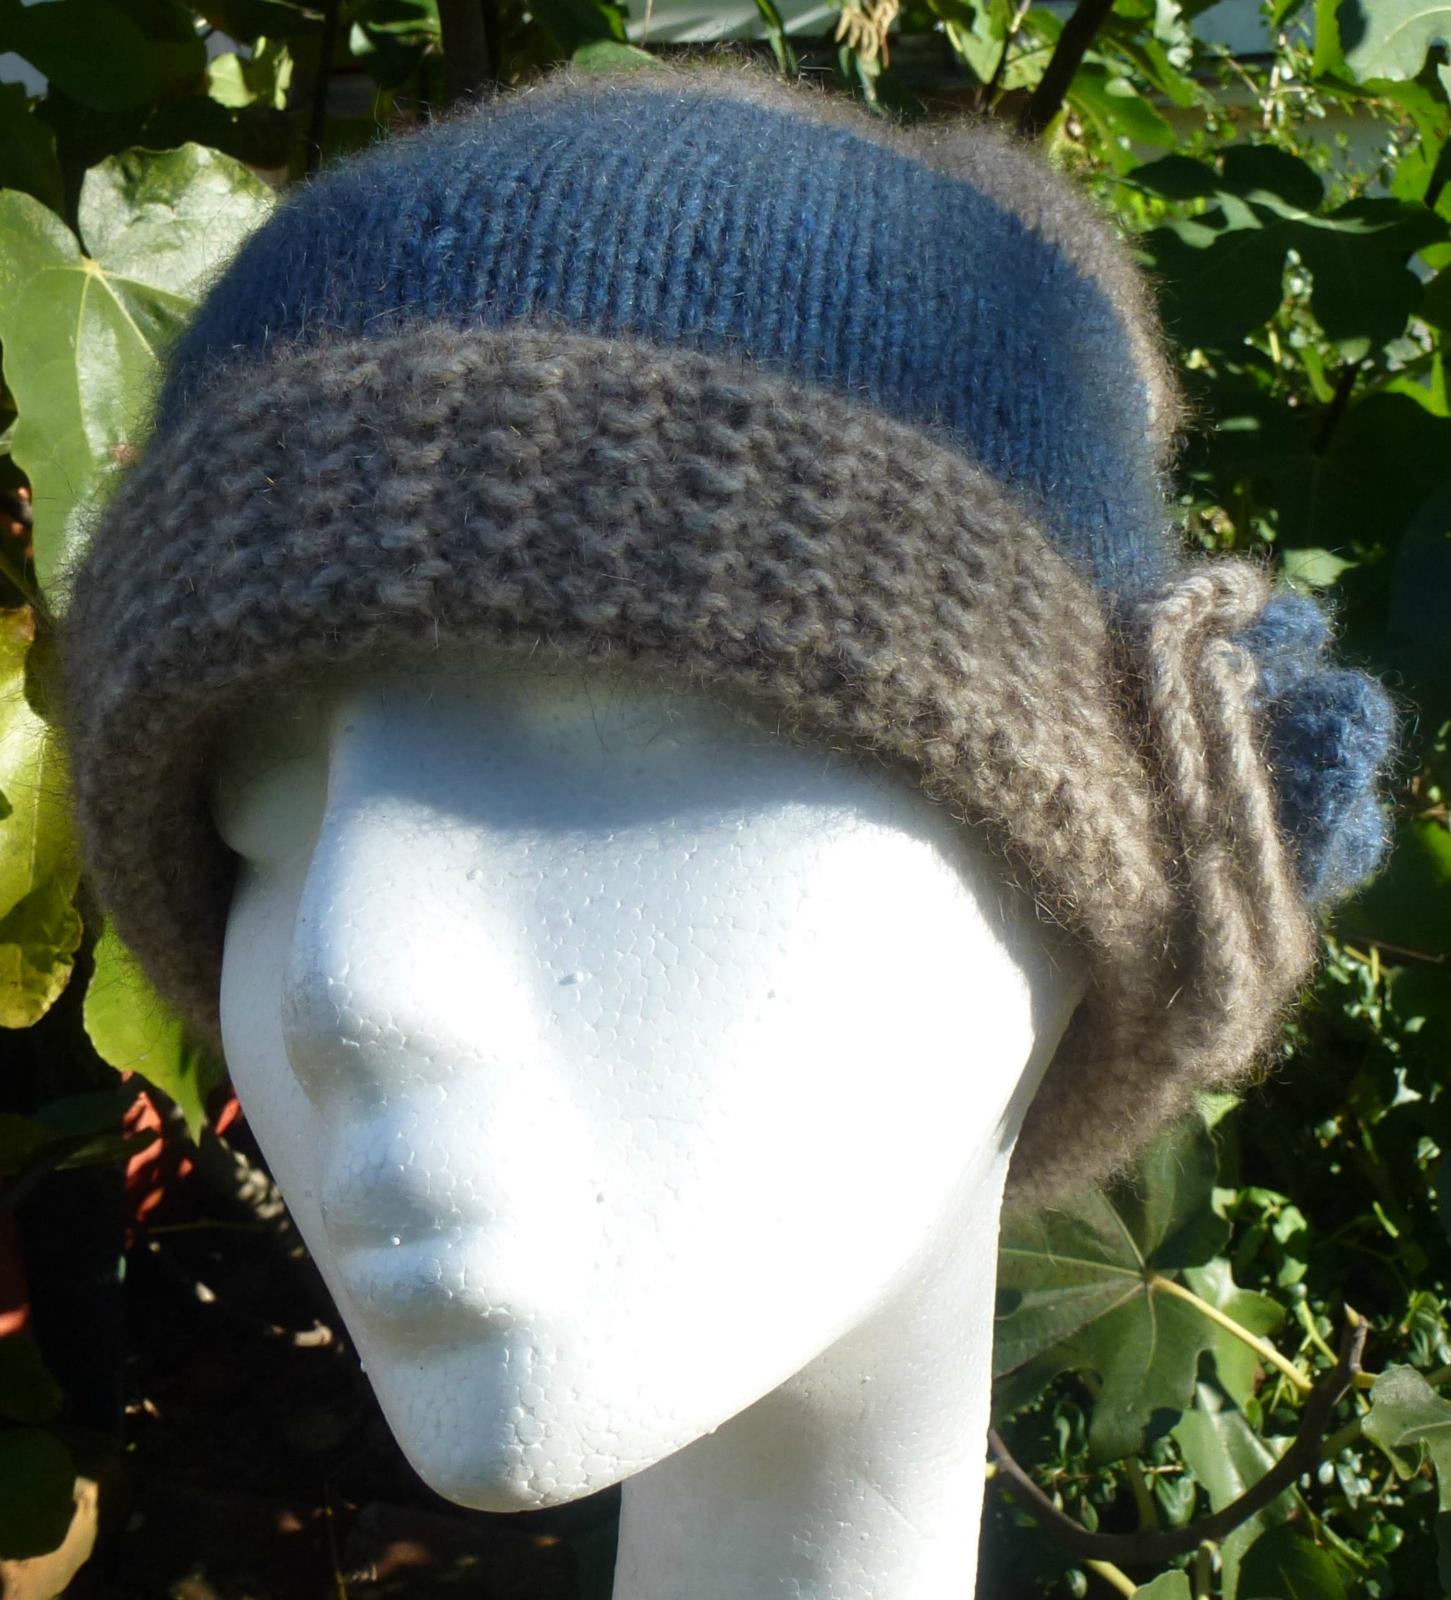 Soft Luxurious Possum Merino & Silk Hand Knitted Cloche Hats Felt